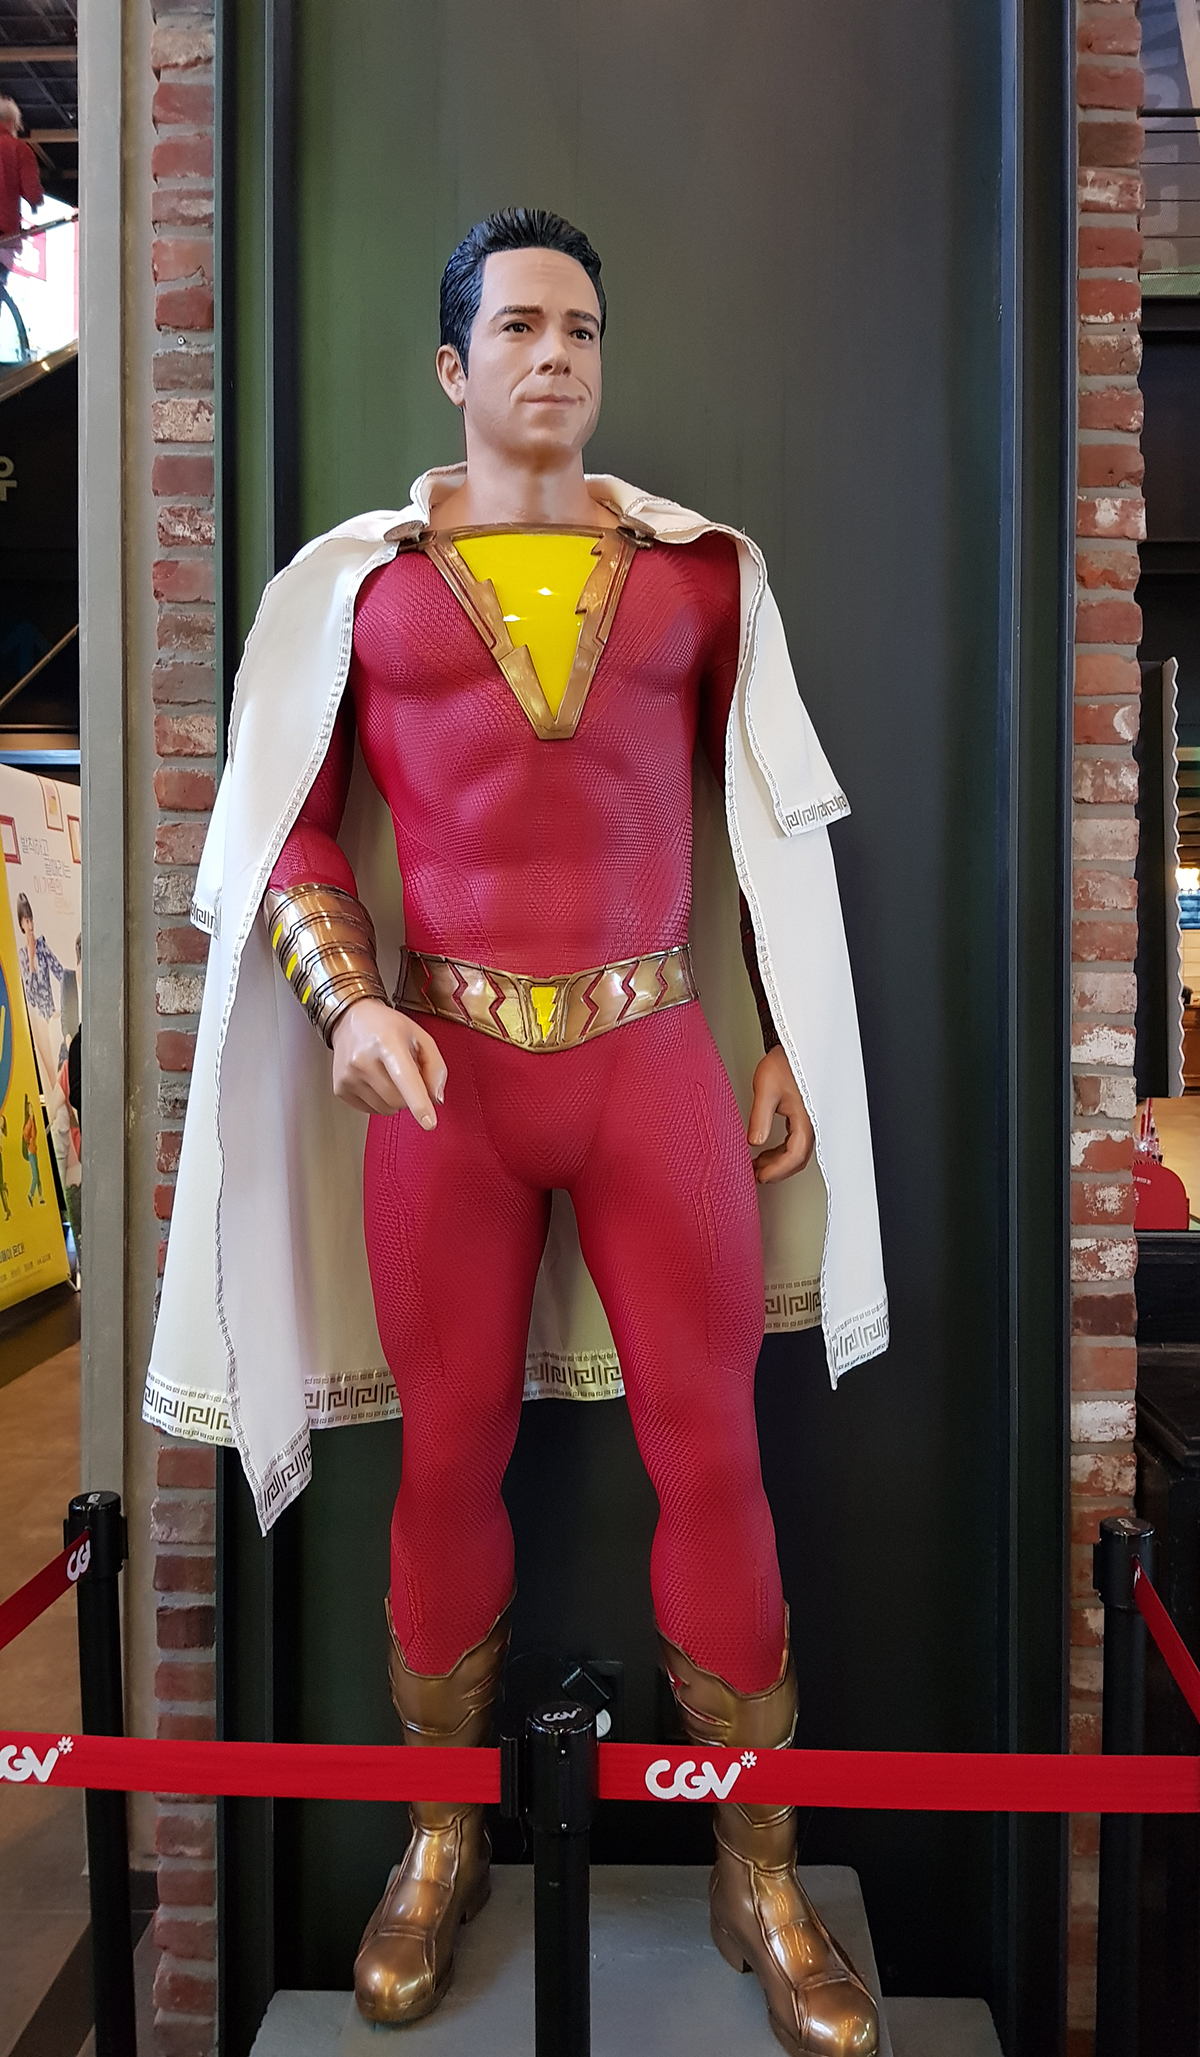 Captain Marvel DC Comics – Wikipedia